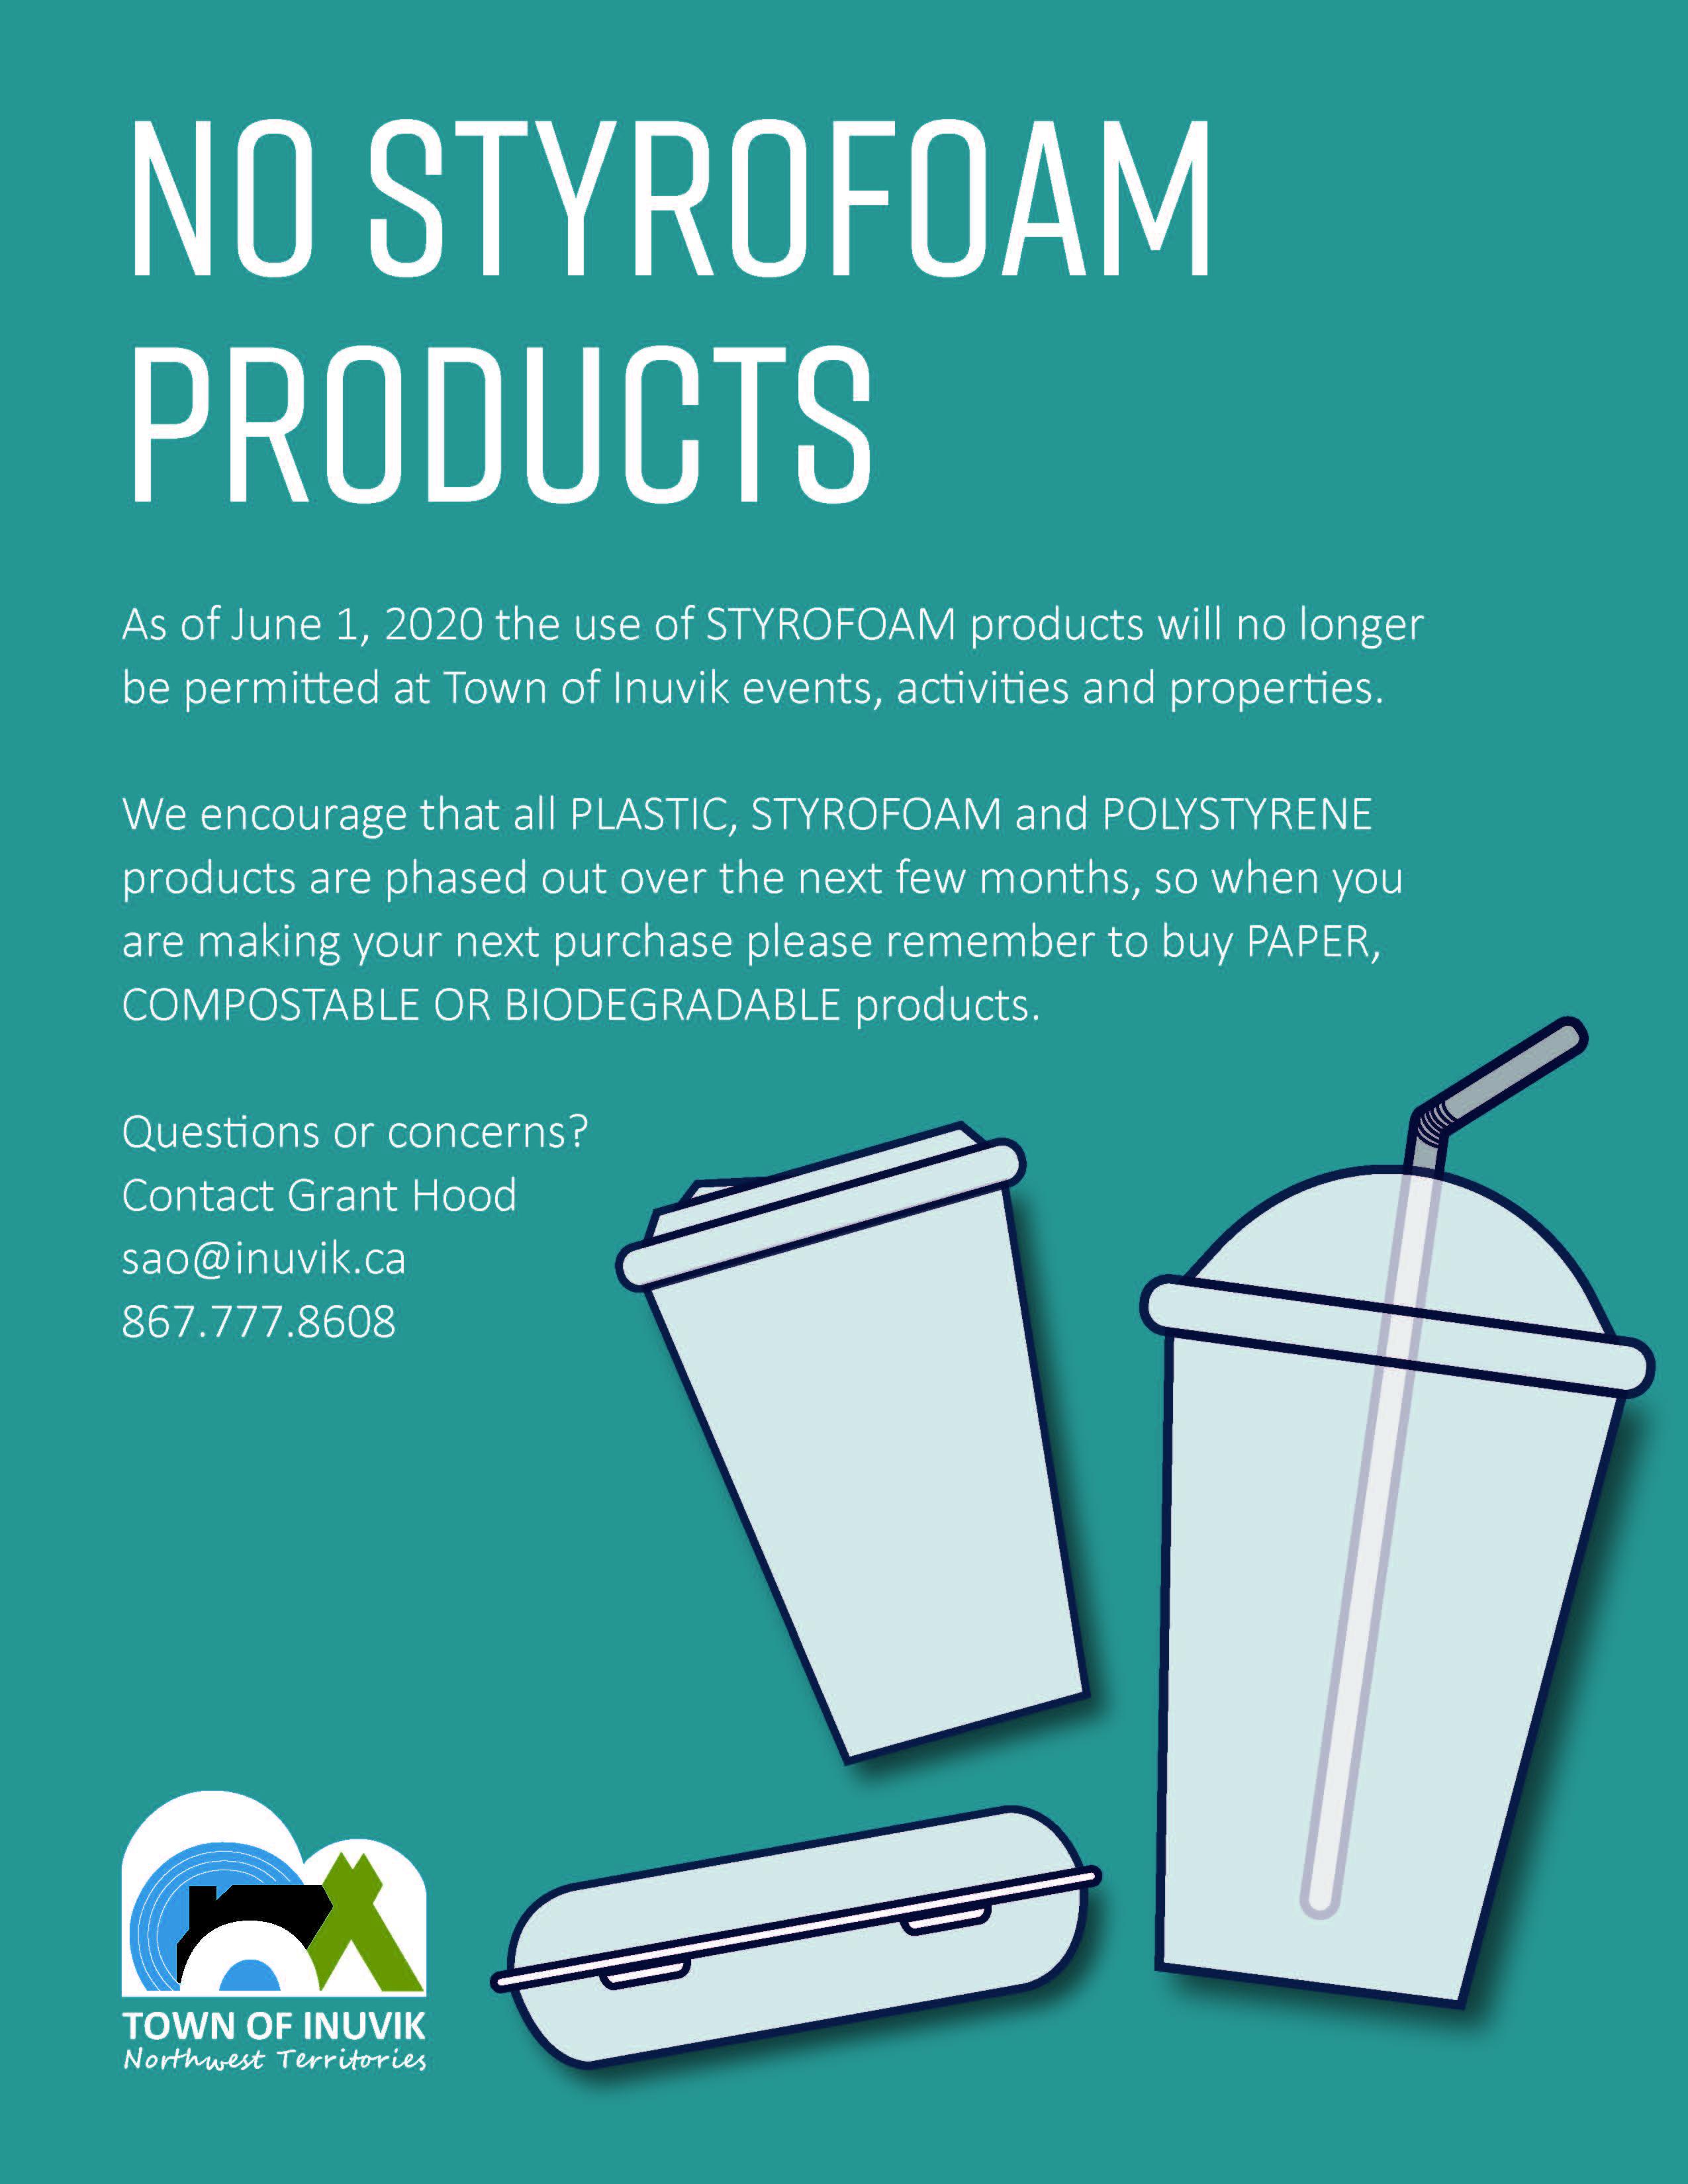 No Styrofoam Products